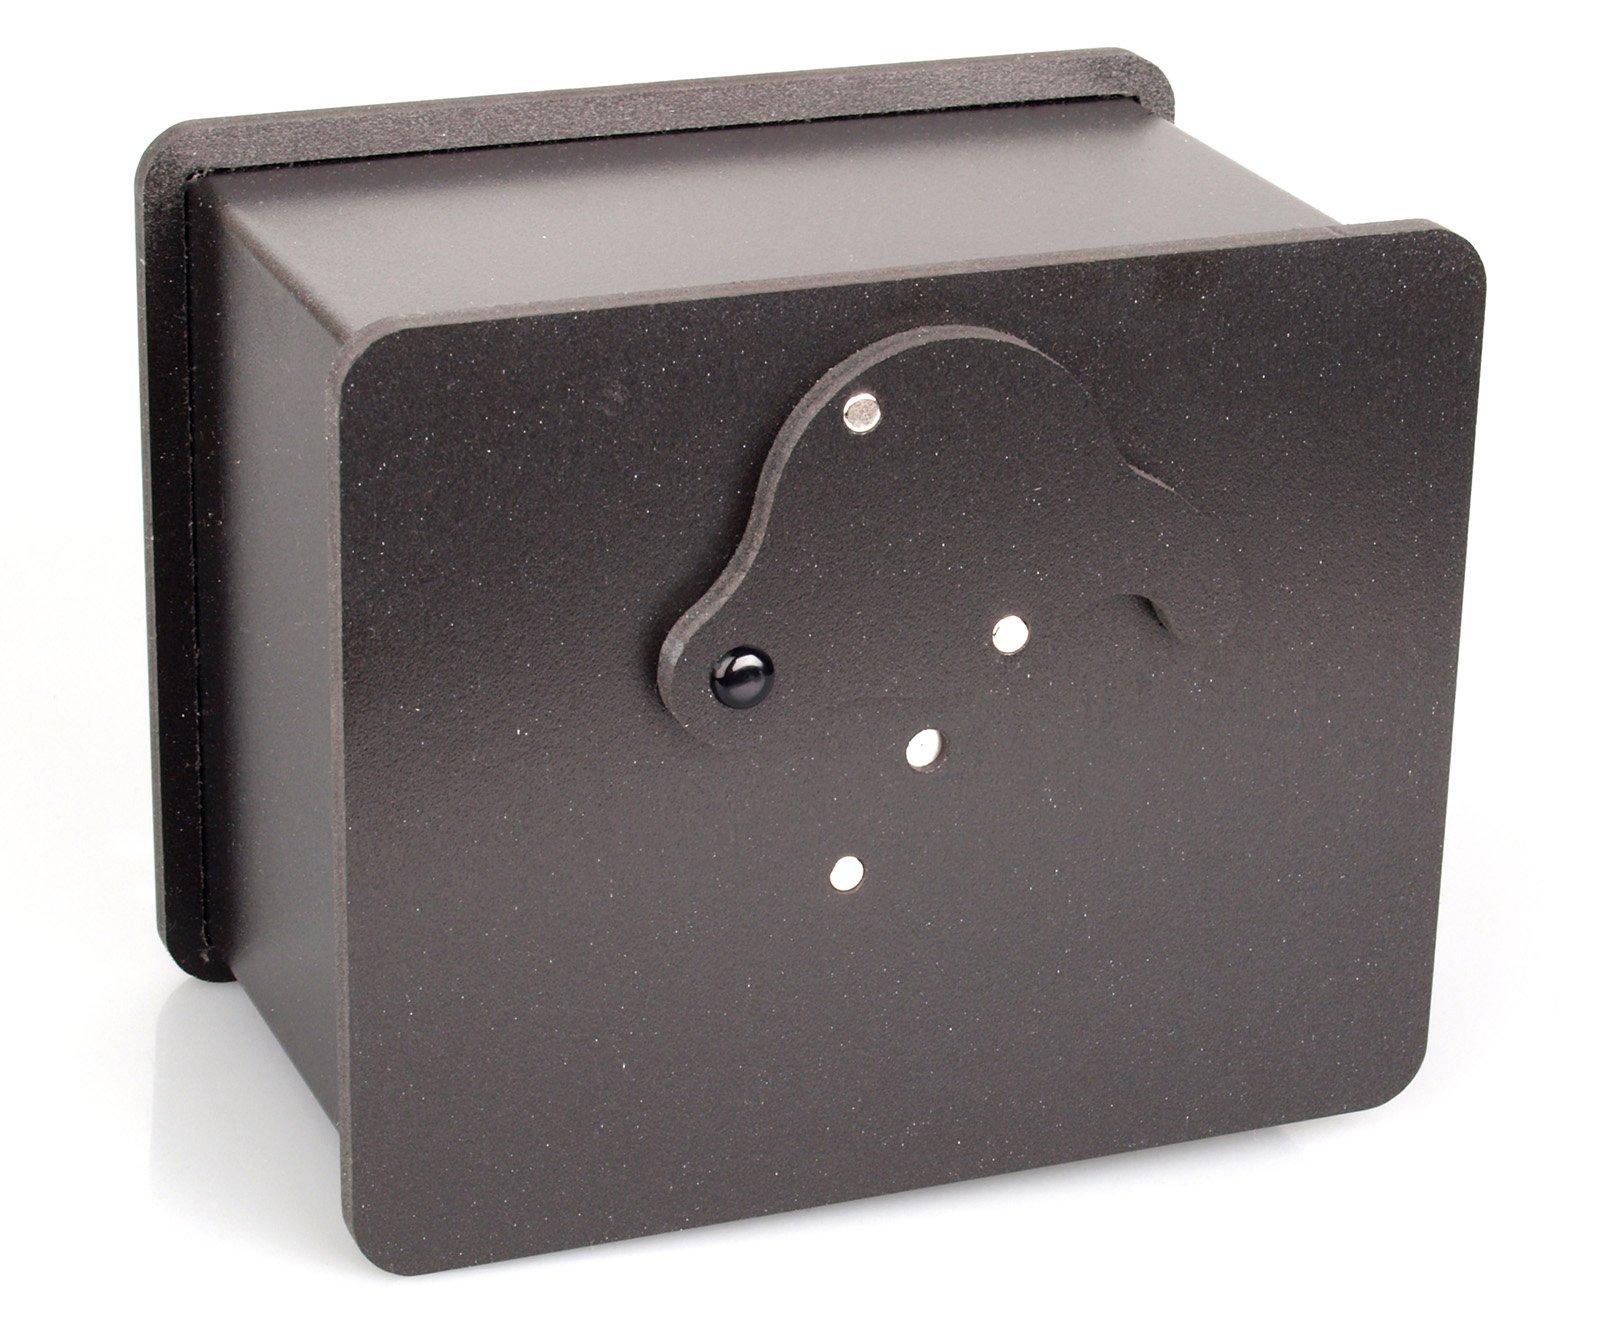 Ilford 1174025-Pinhole Camera by Ilford